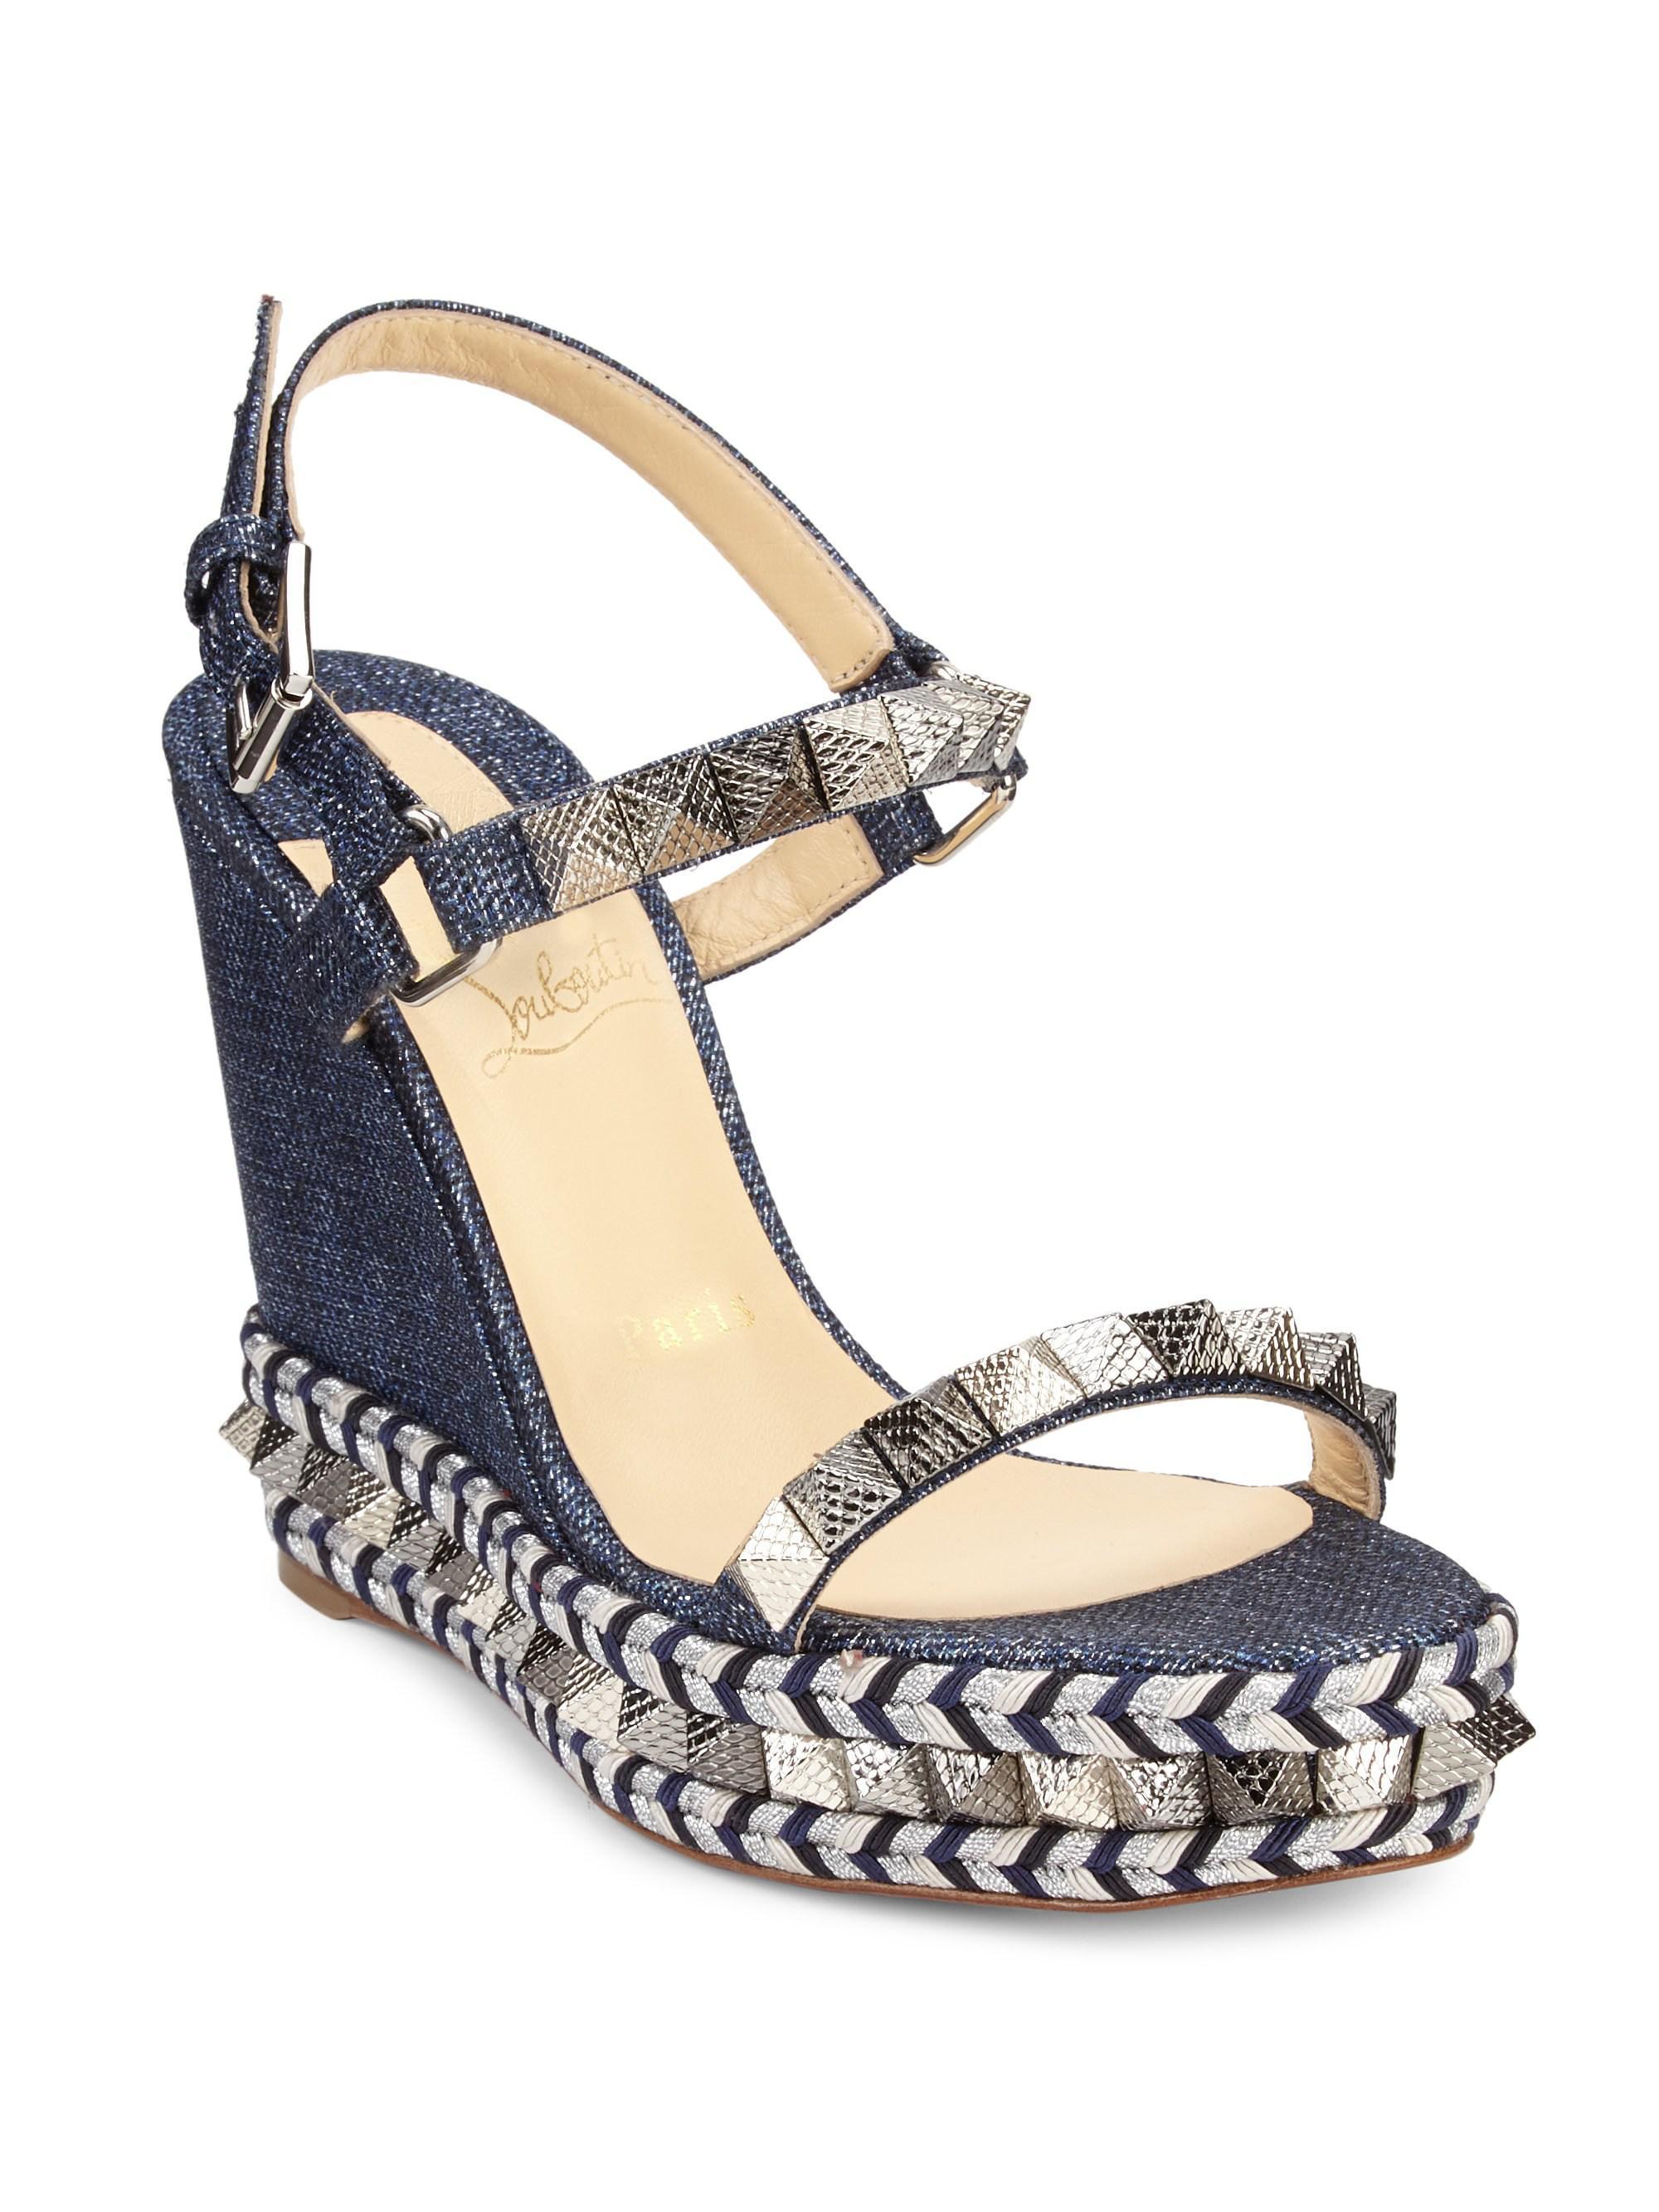 a8583a0c99 ... uk christian louboutin. womens blue pyraclou 110 denim platform sandals  76b70 1df60